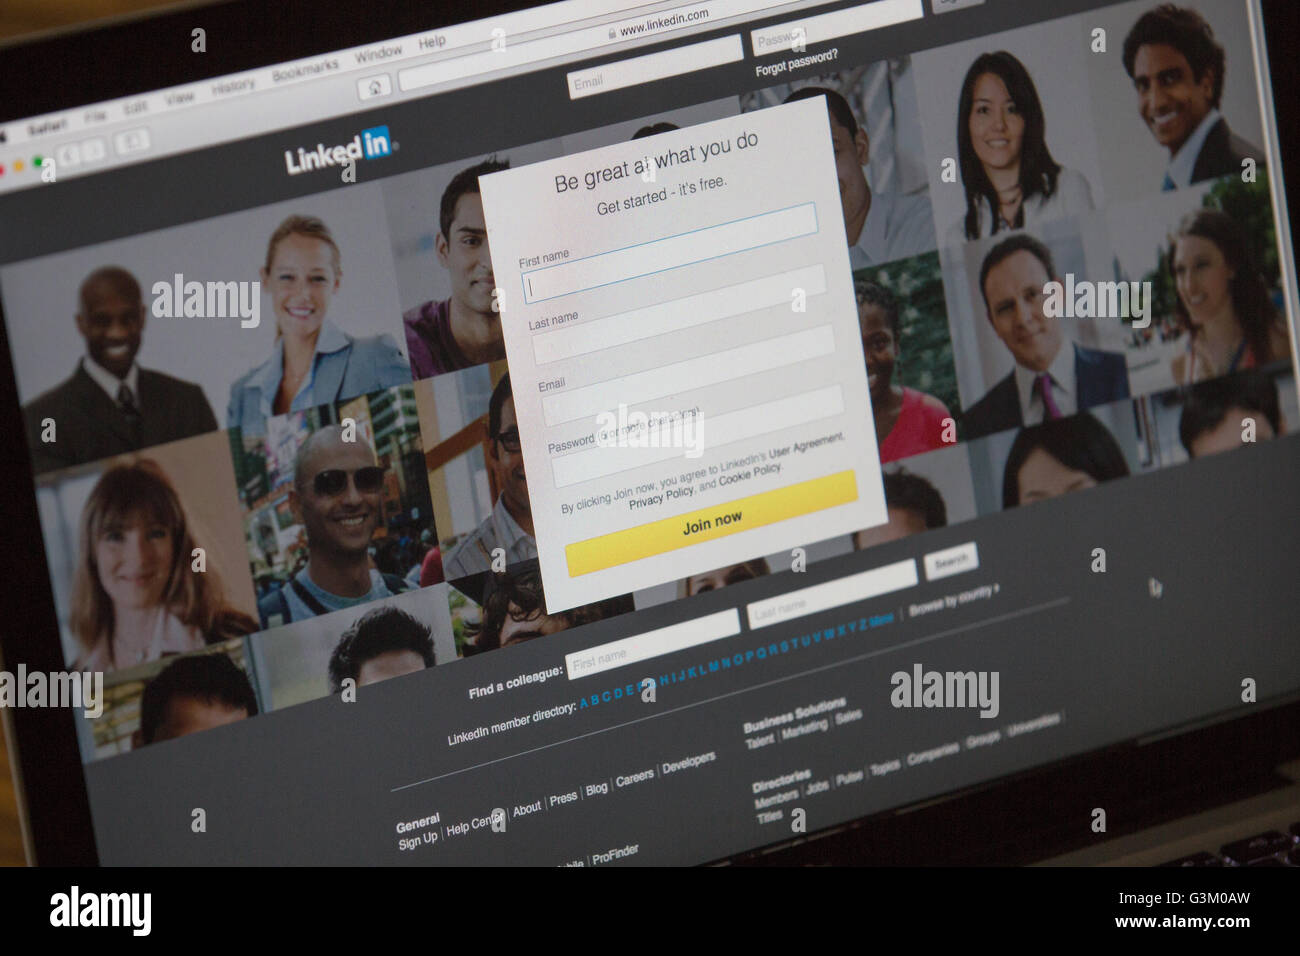 linkedin homepage login screen pictured in kingston ont on june